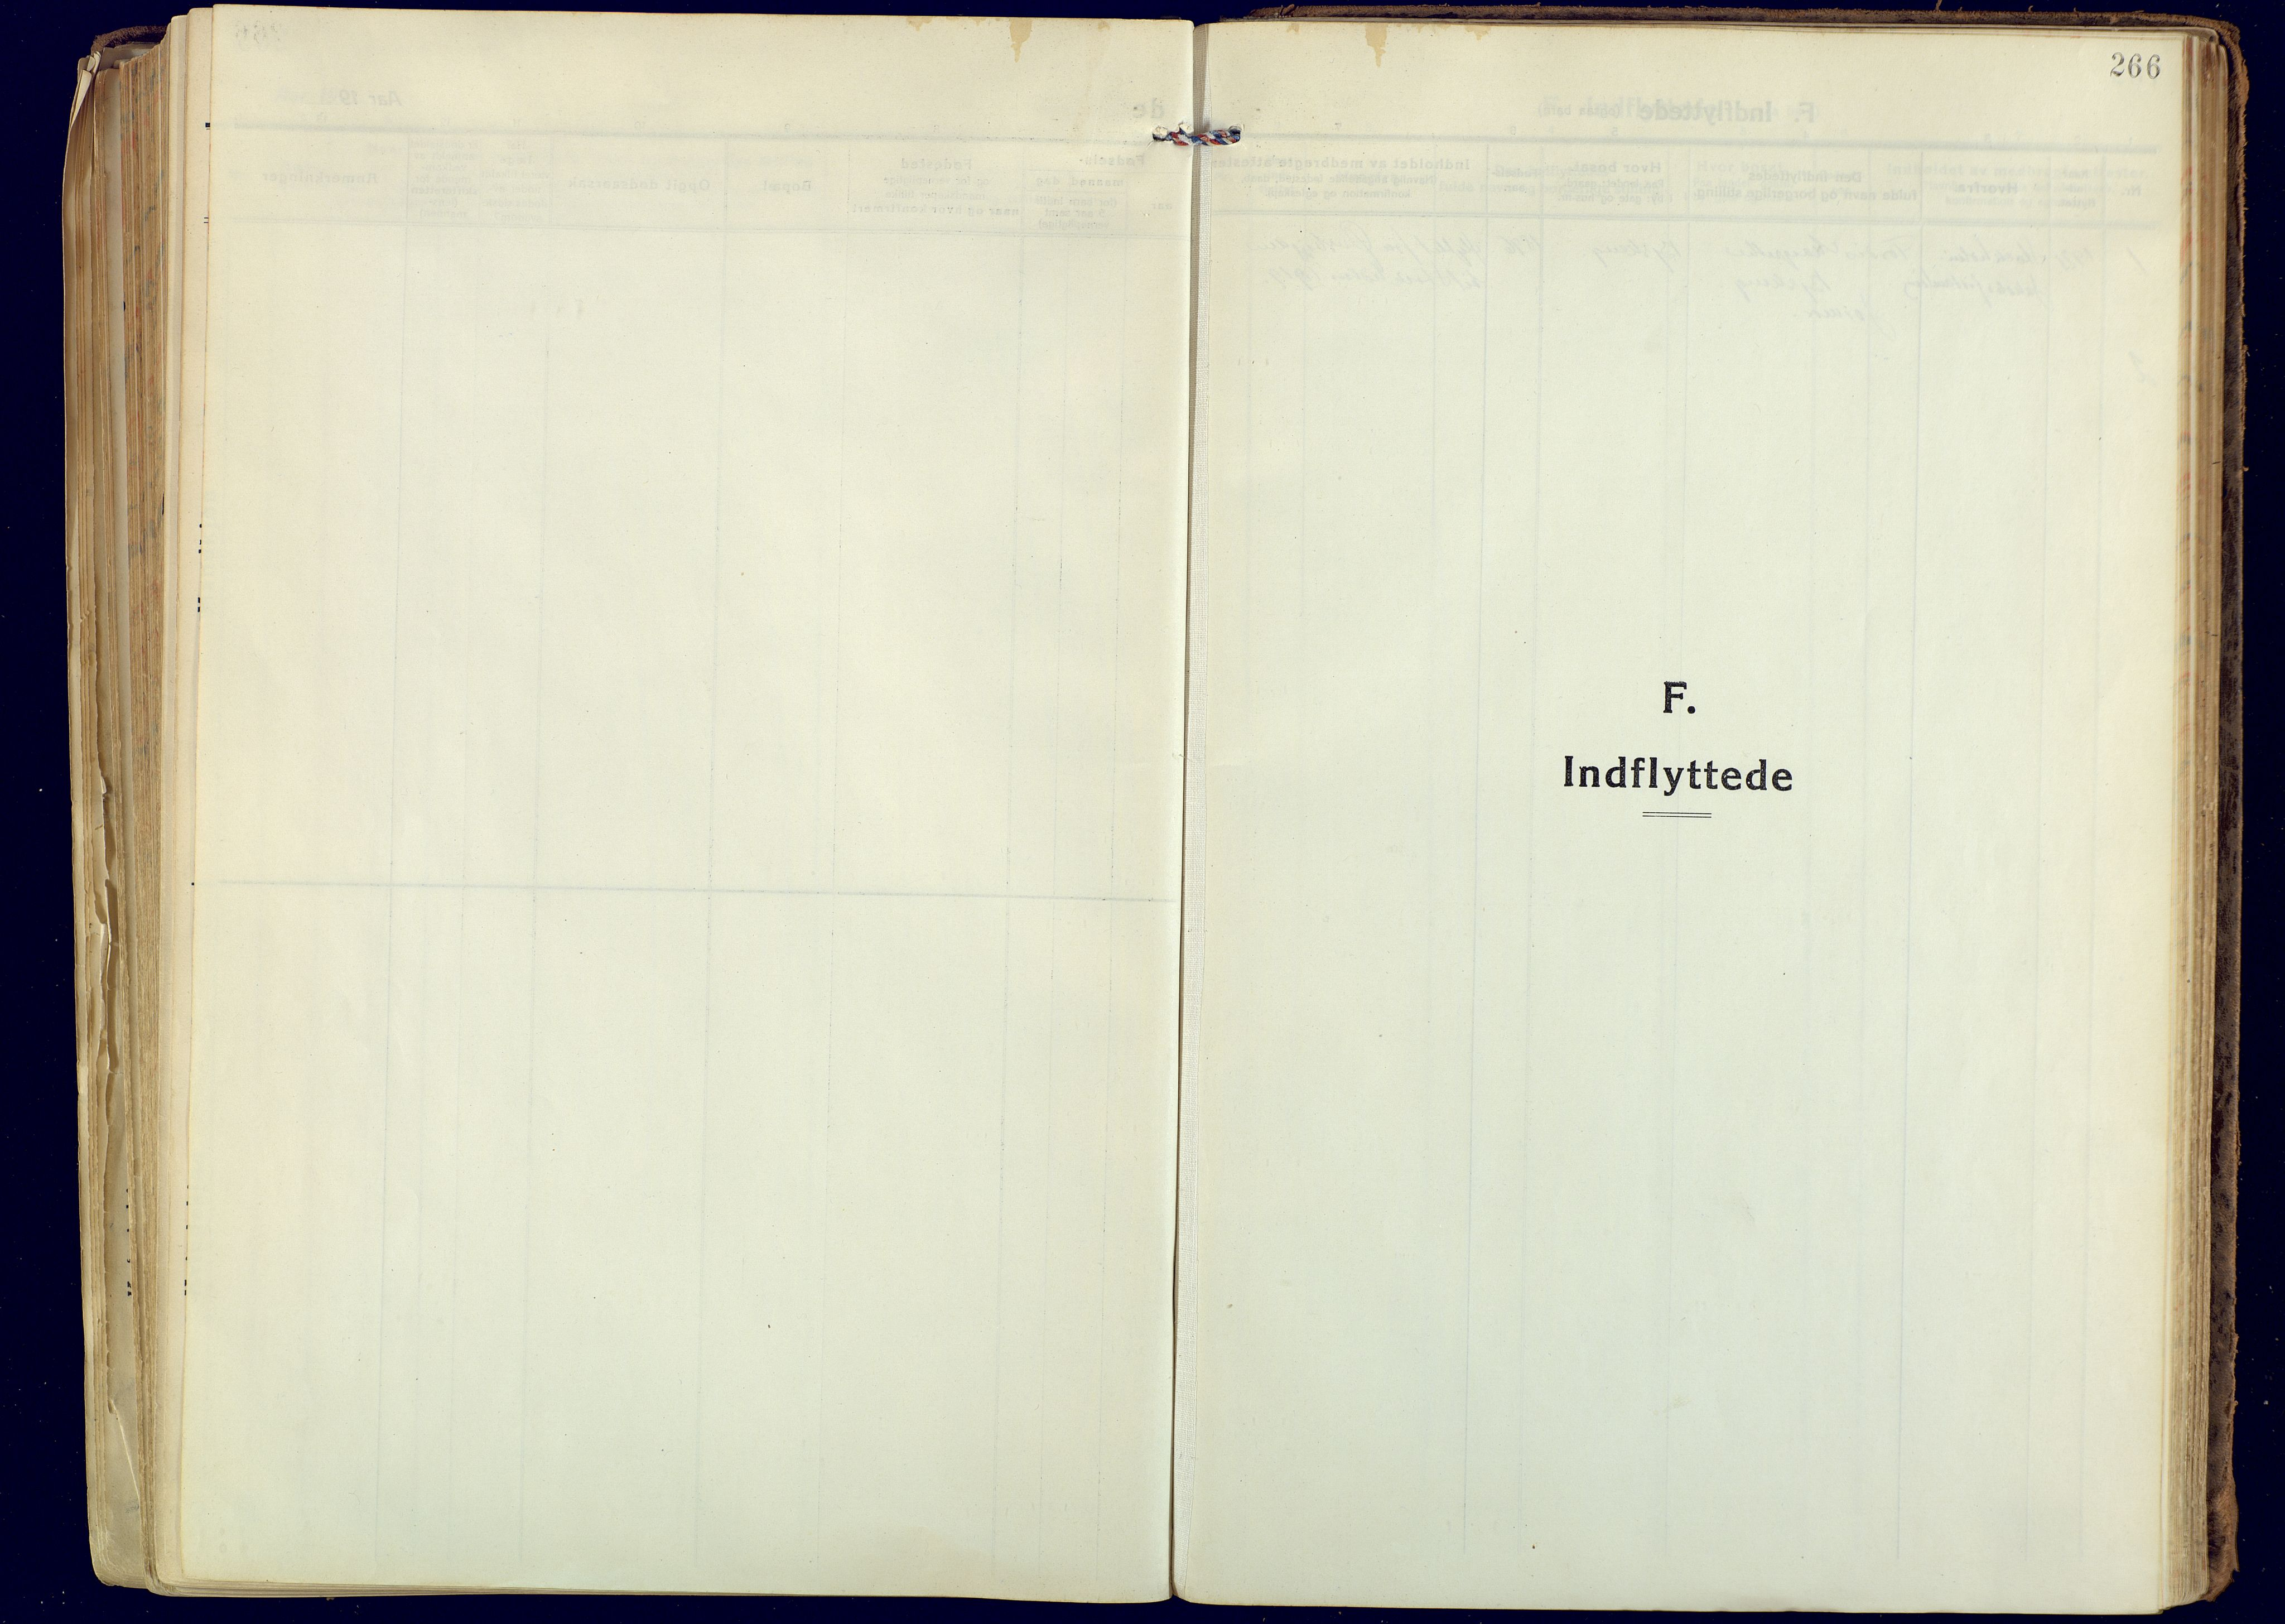 SATØ, Målselv sokneprestembete, Ministerialbok nr. 14, 1919-1932, s. 266